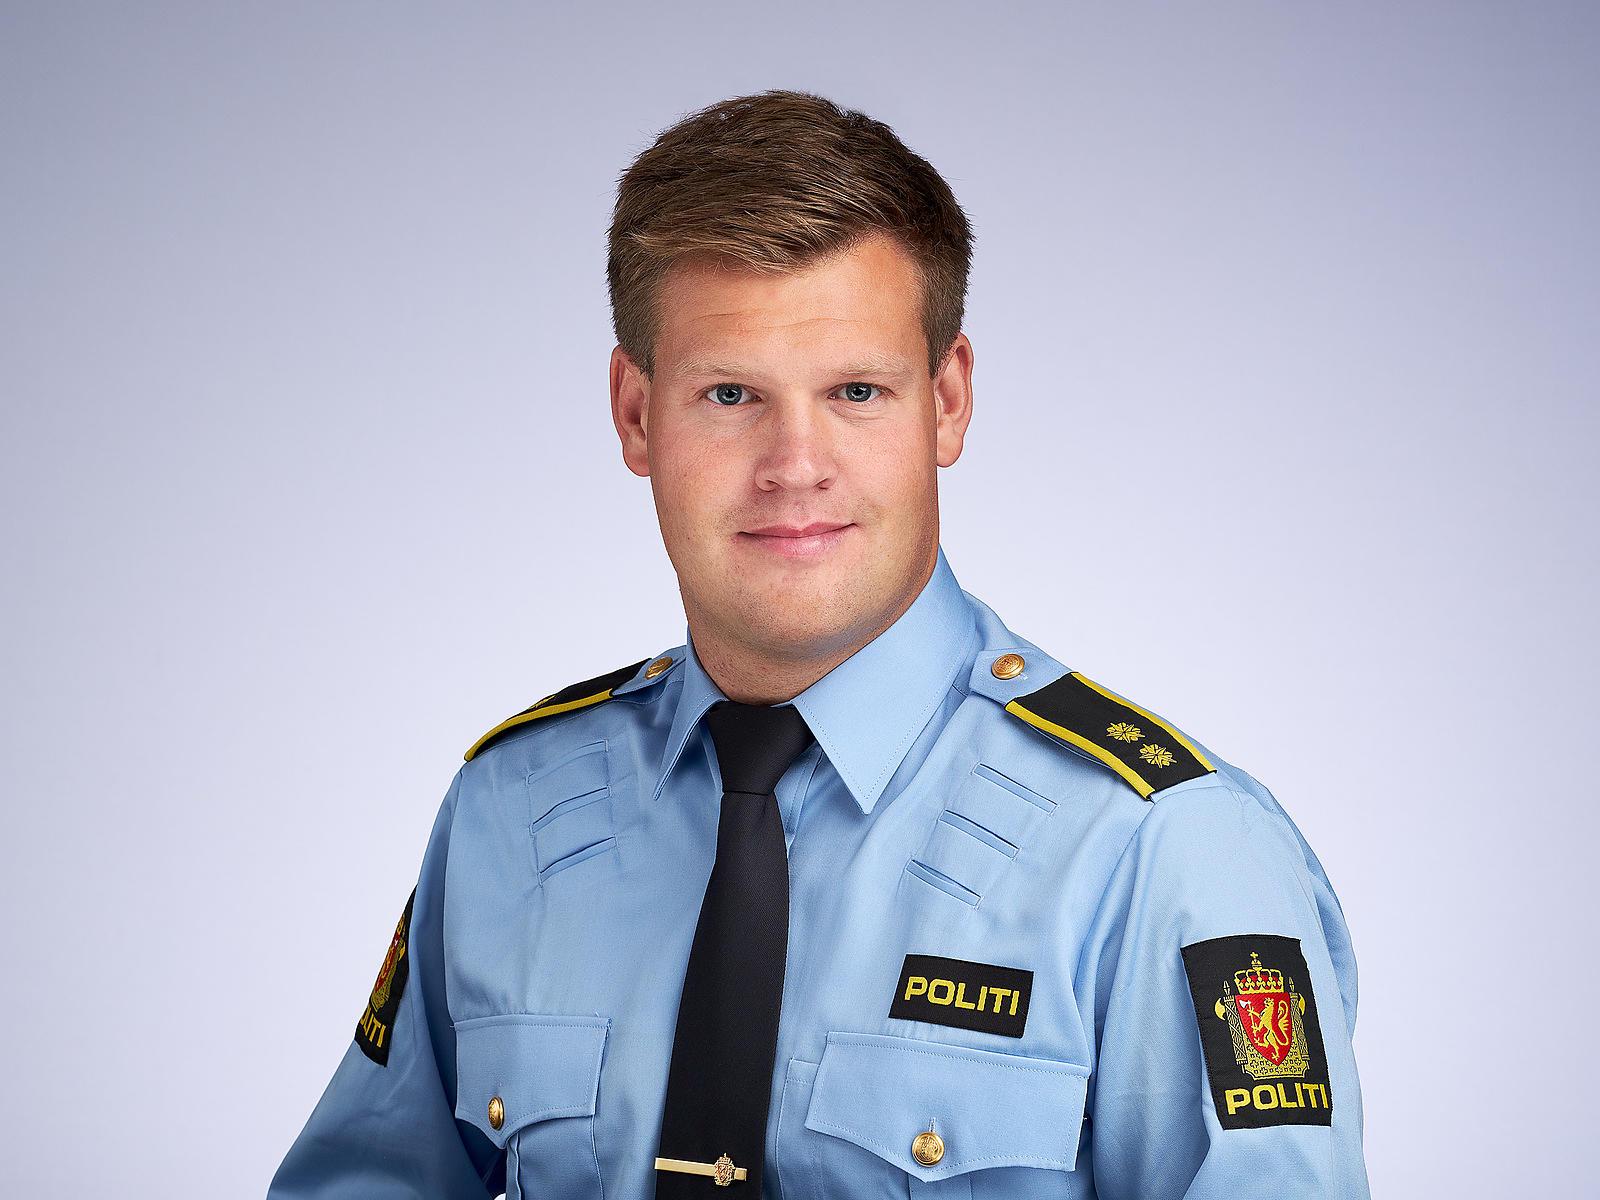 Fotograf Eivind Rohne Politiportrett